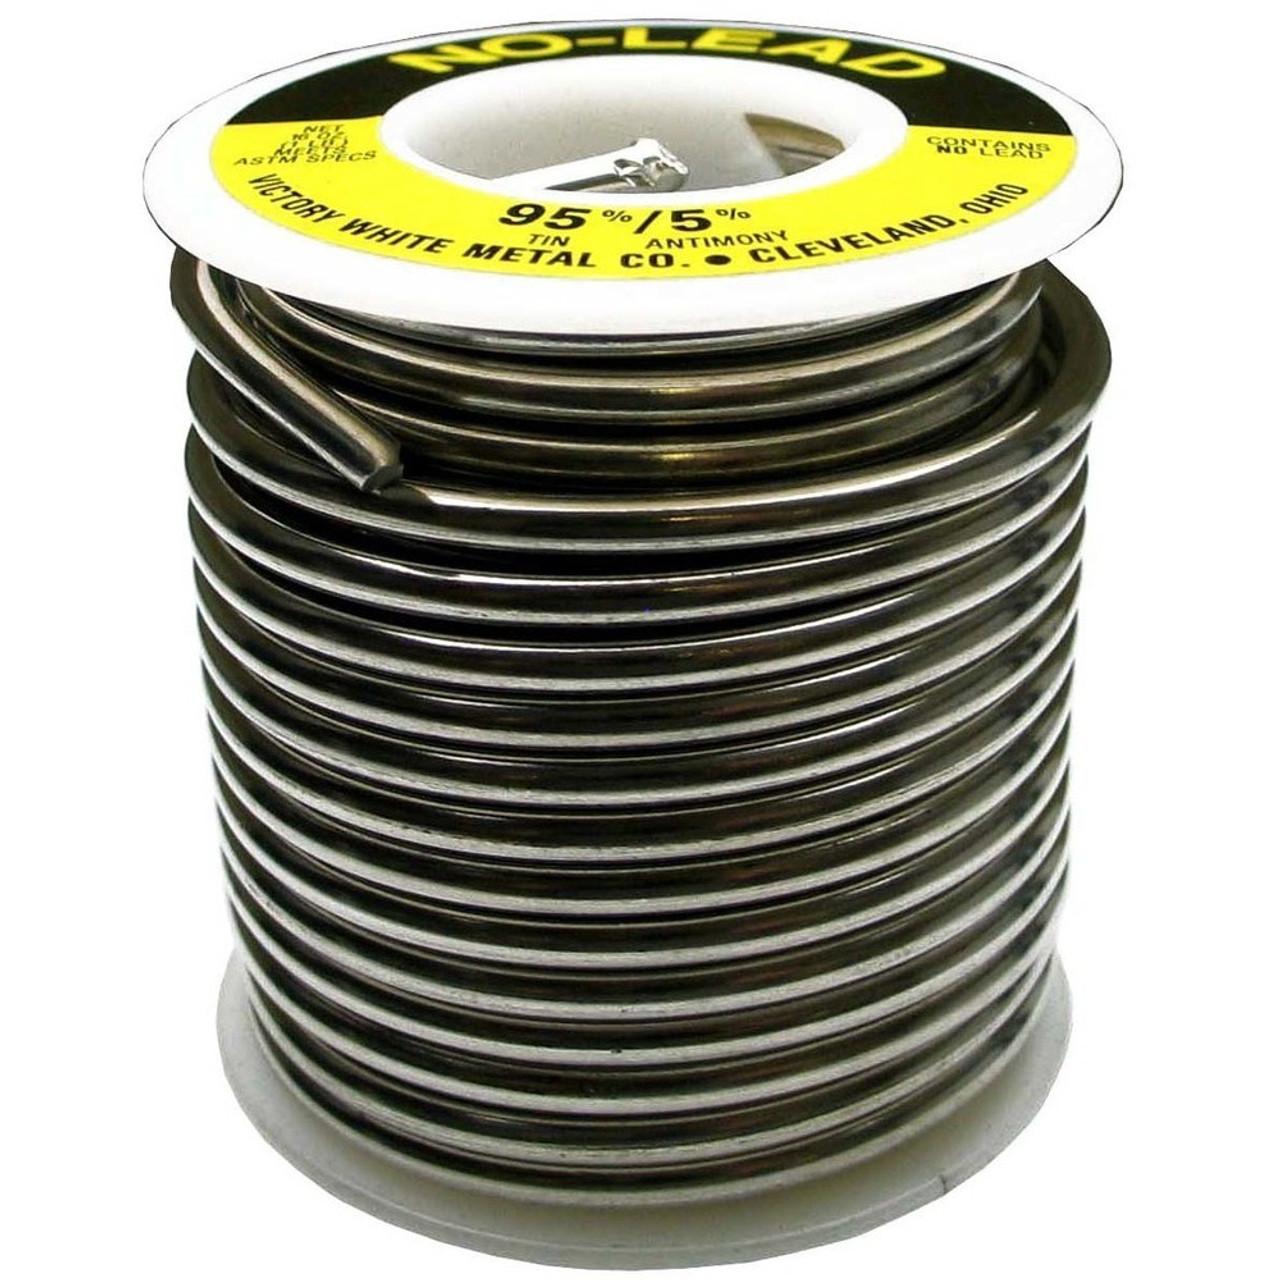 "Lead Free Wire Solder 95/5 1 lb Spool 1/8"" .125 Dia. Free Shipping"